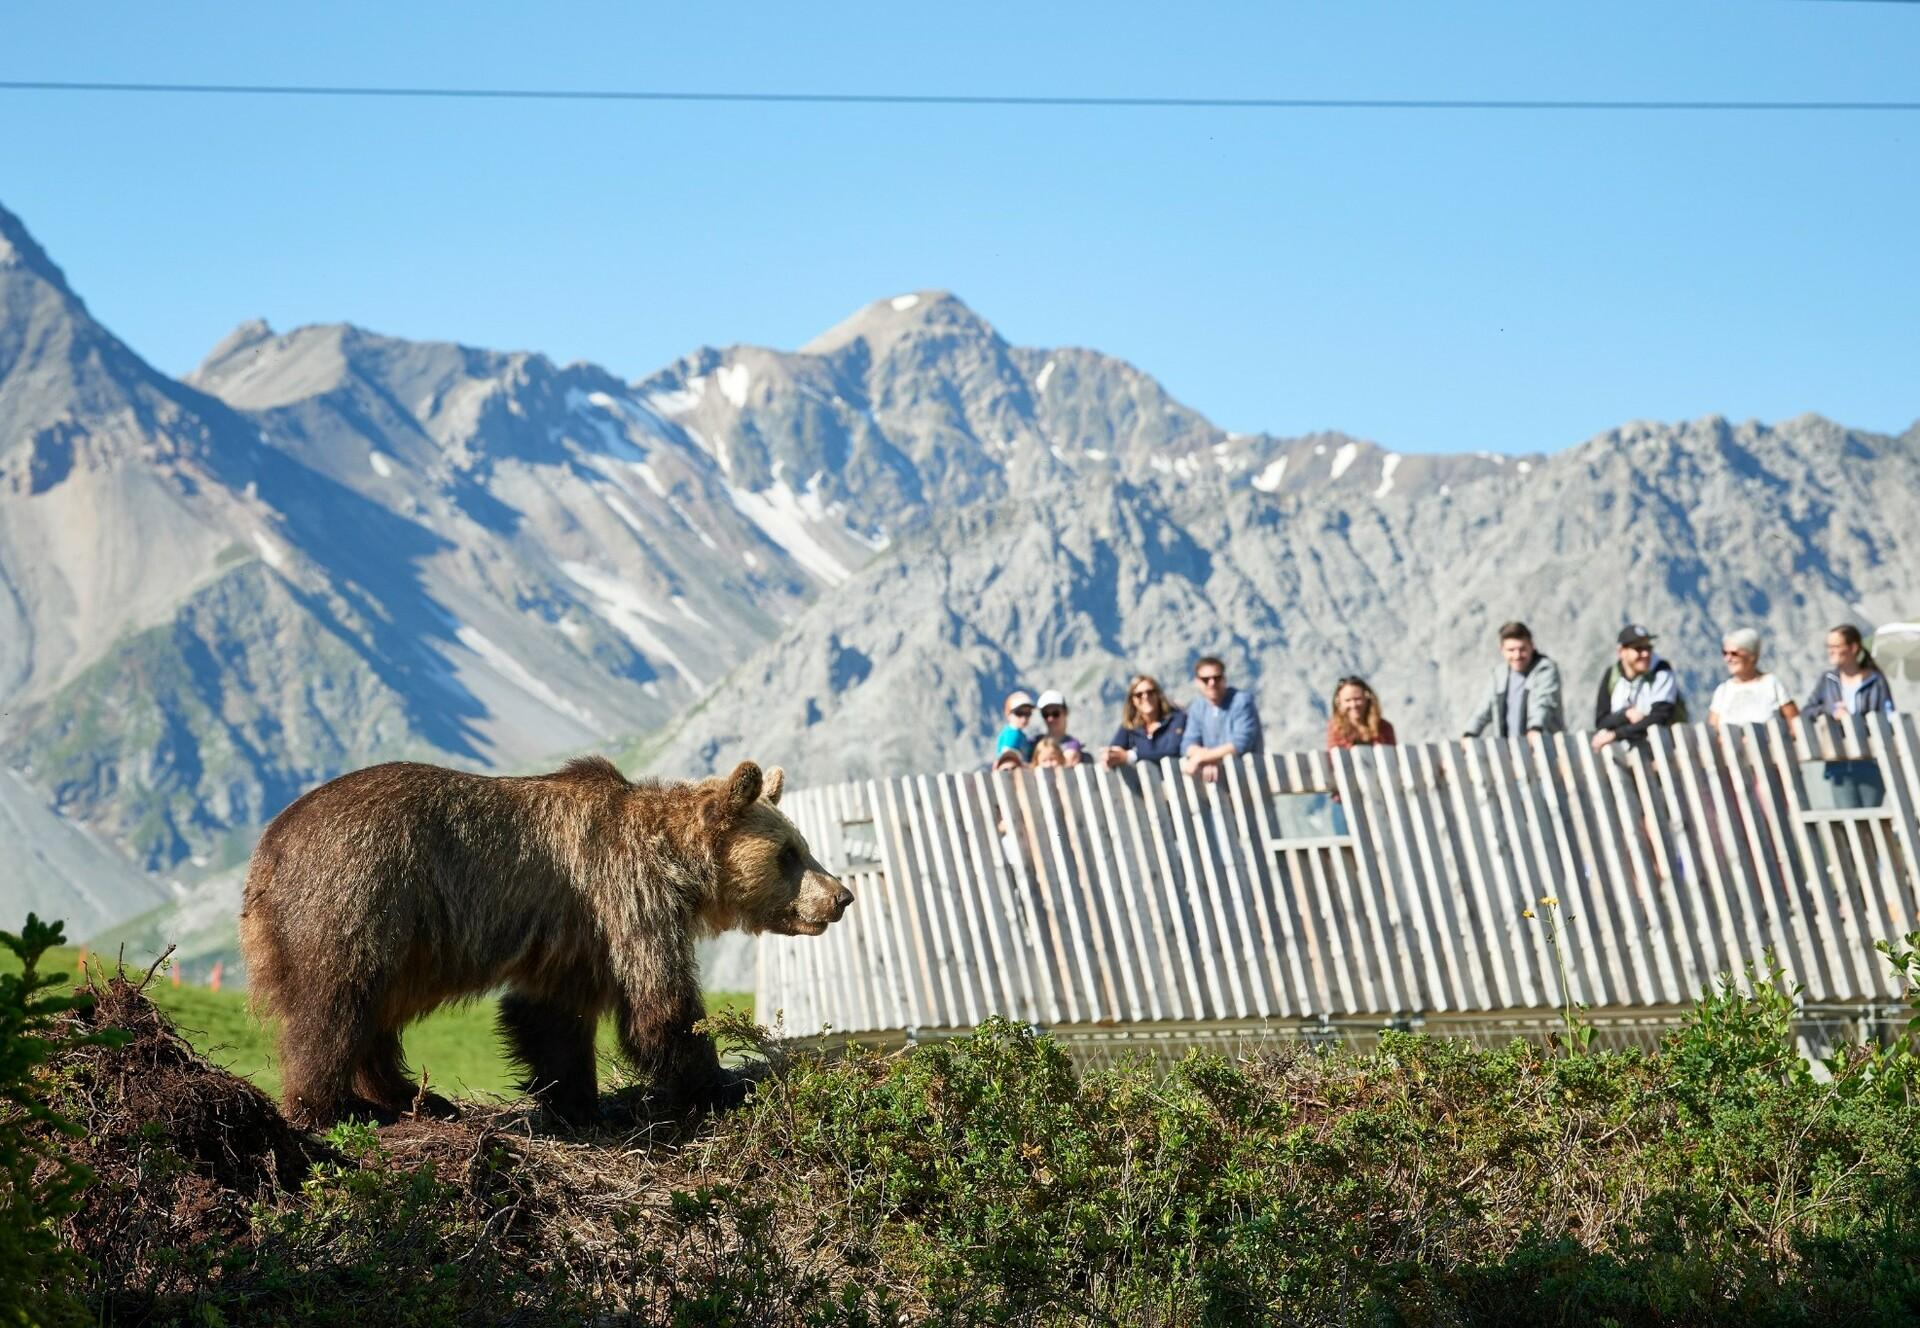 Bear Amelia in the Arosa Bear Sanctuary